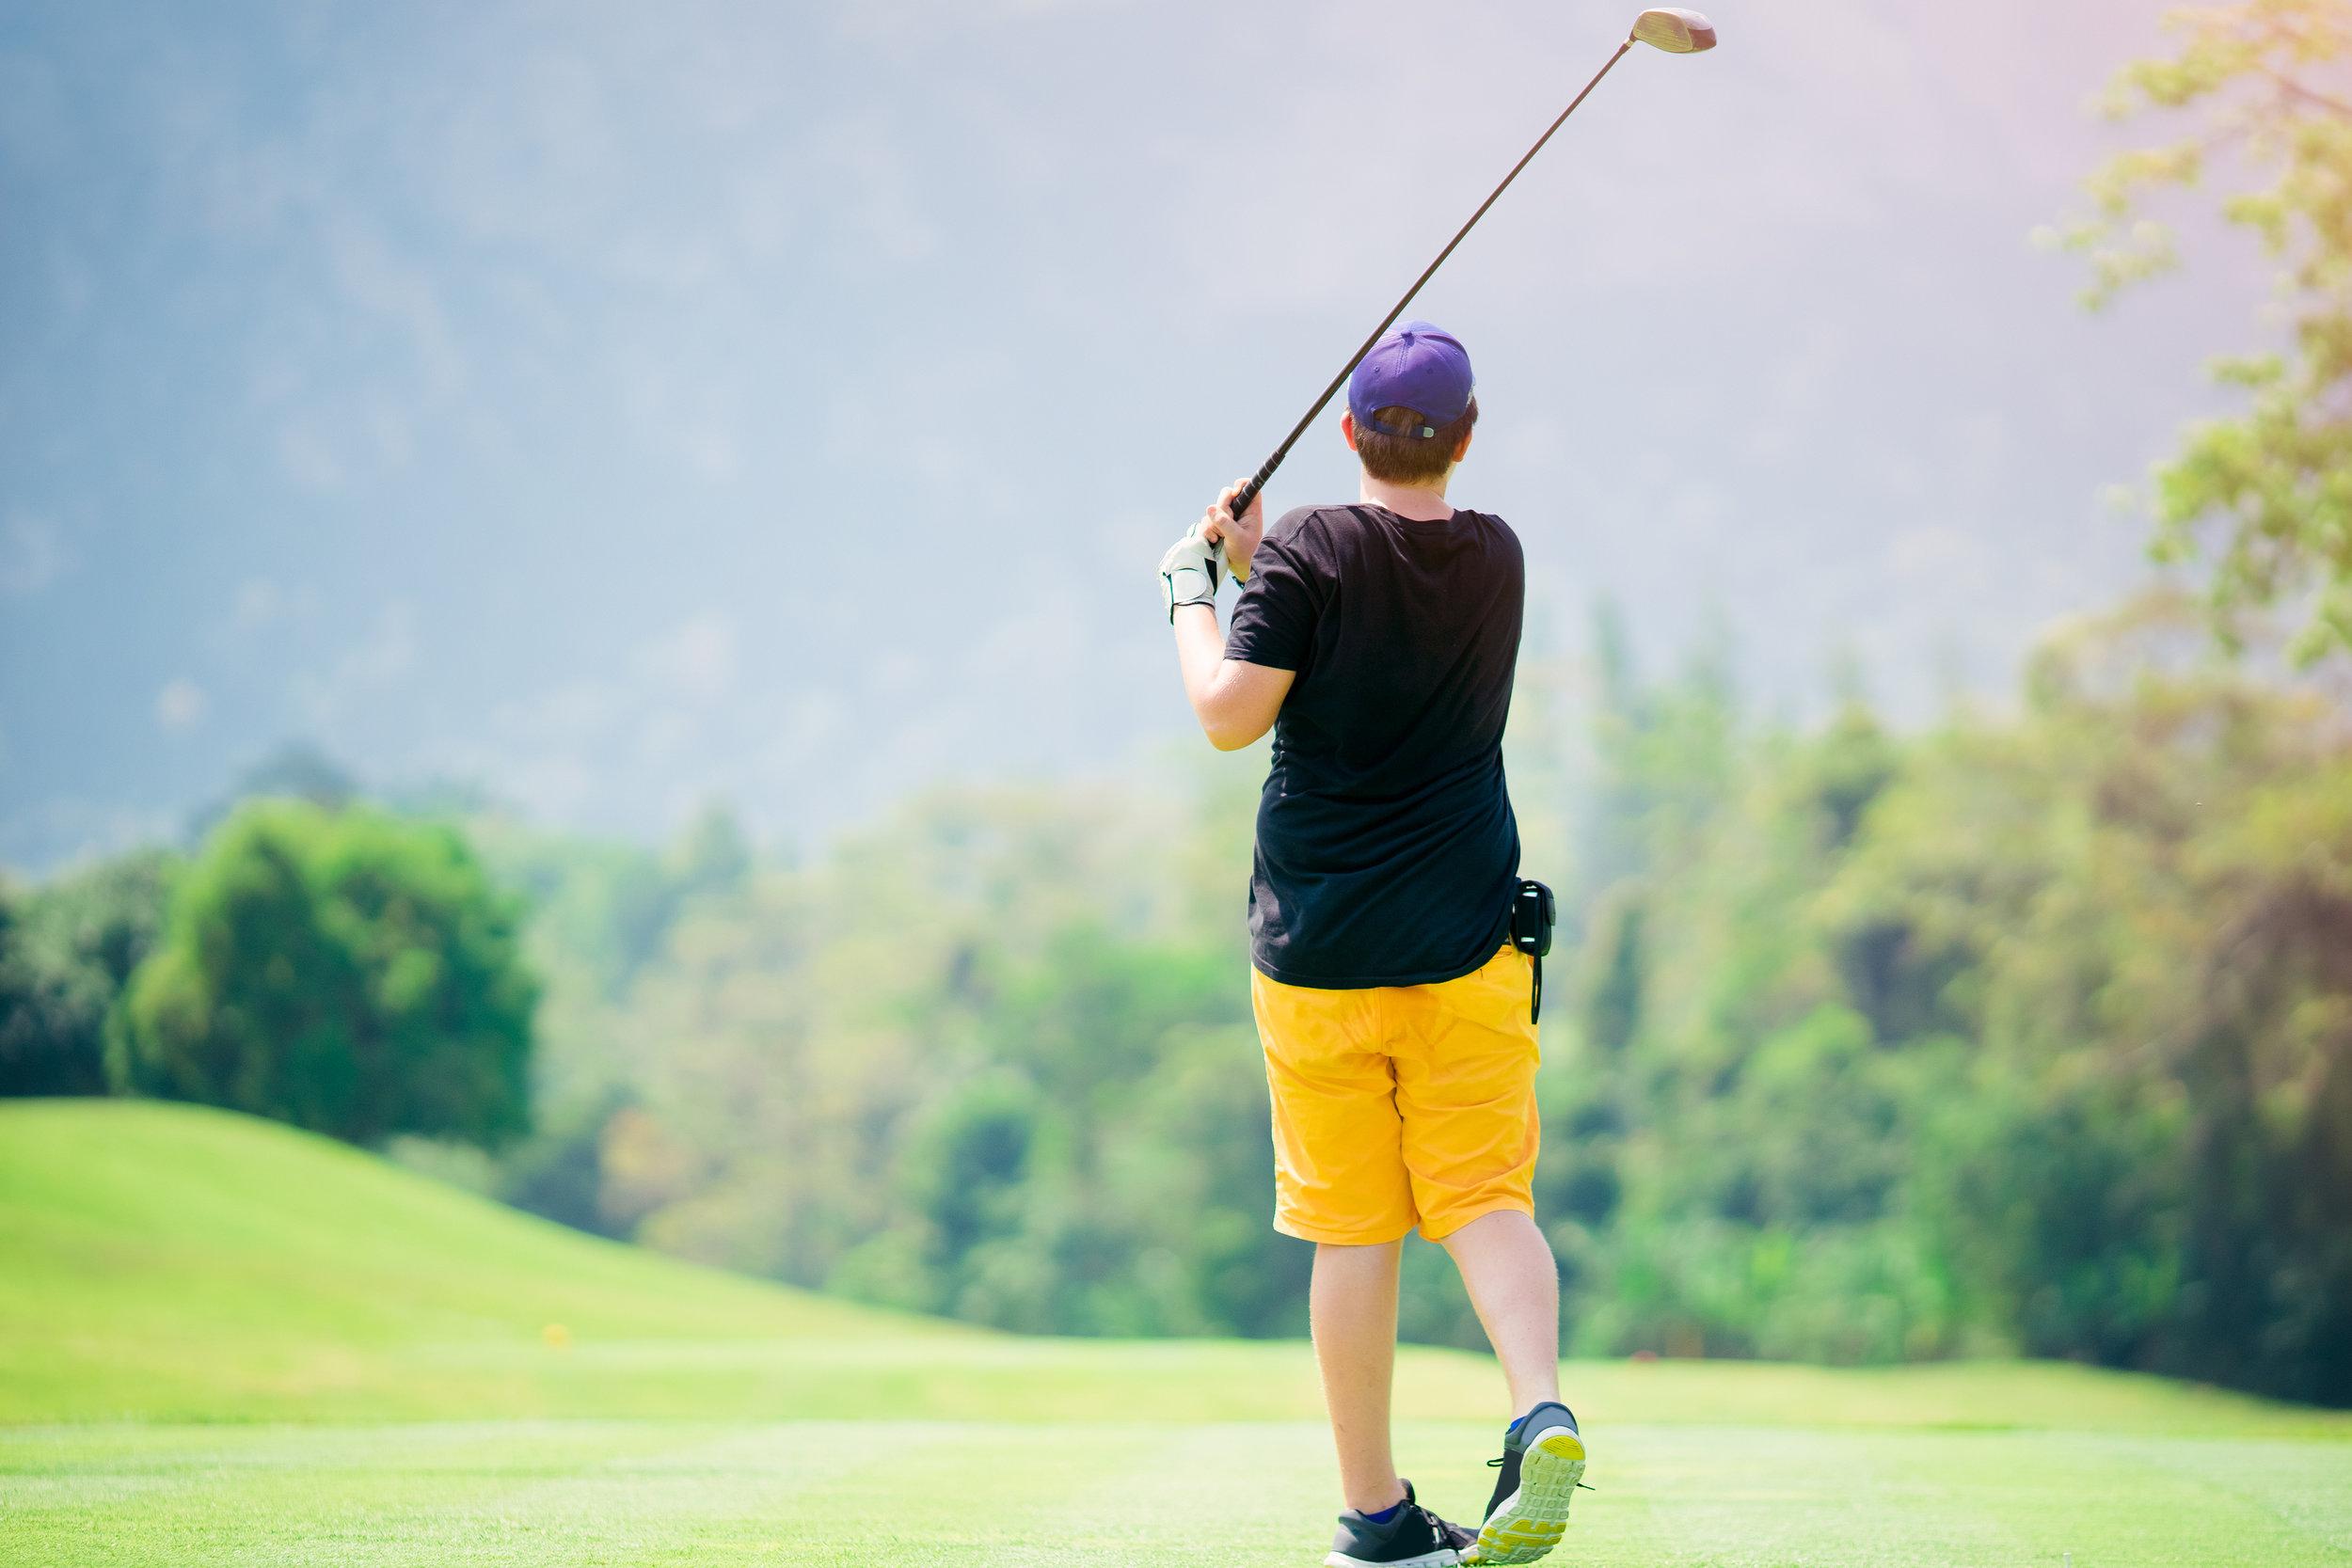 bigstock-Golfer-Hitting-Golf-Shot-With--221858920.jpg